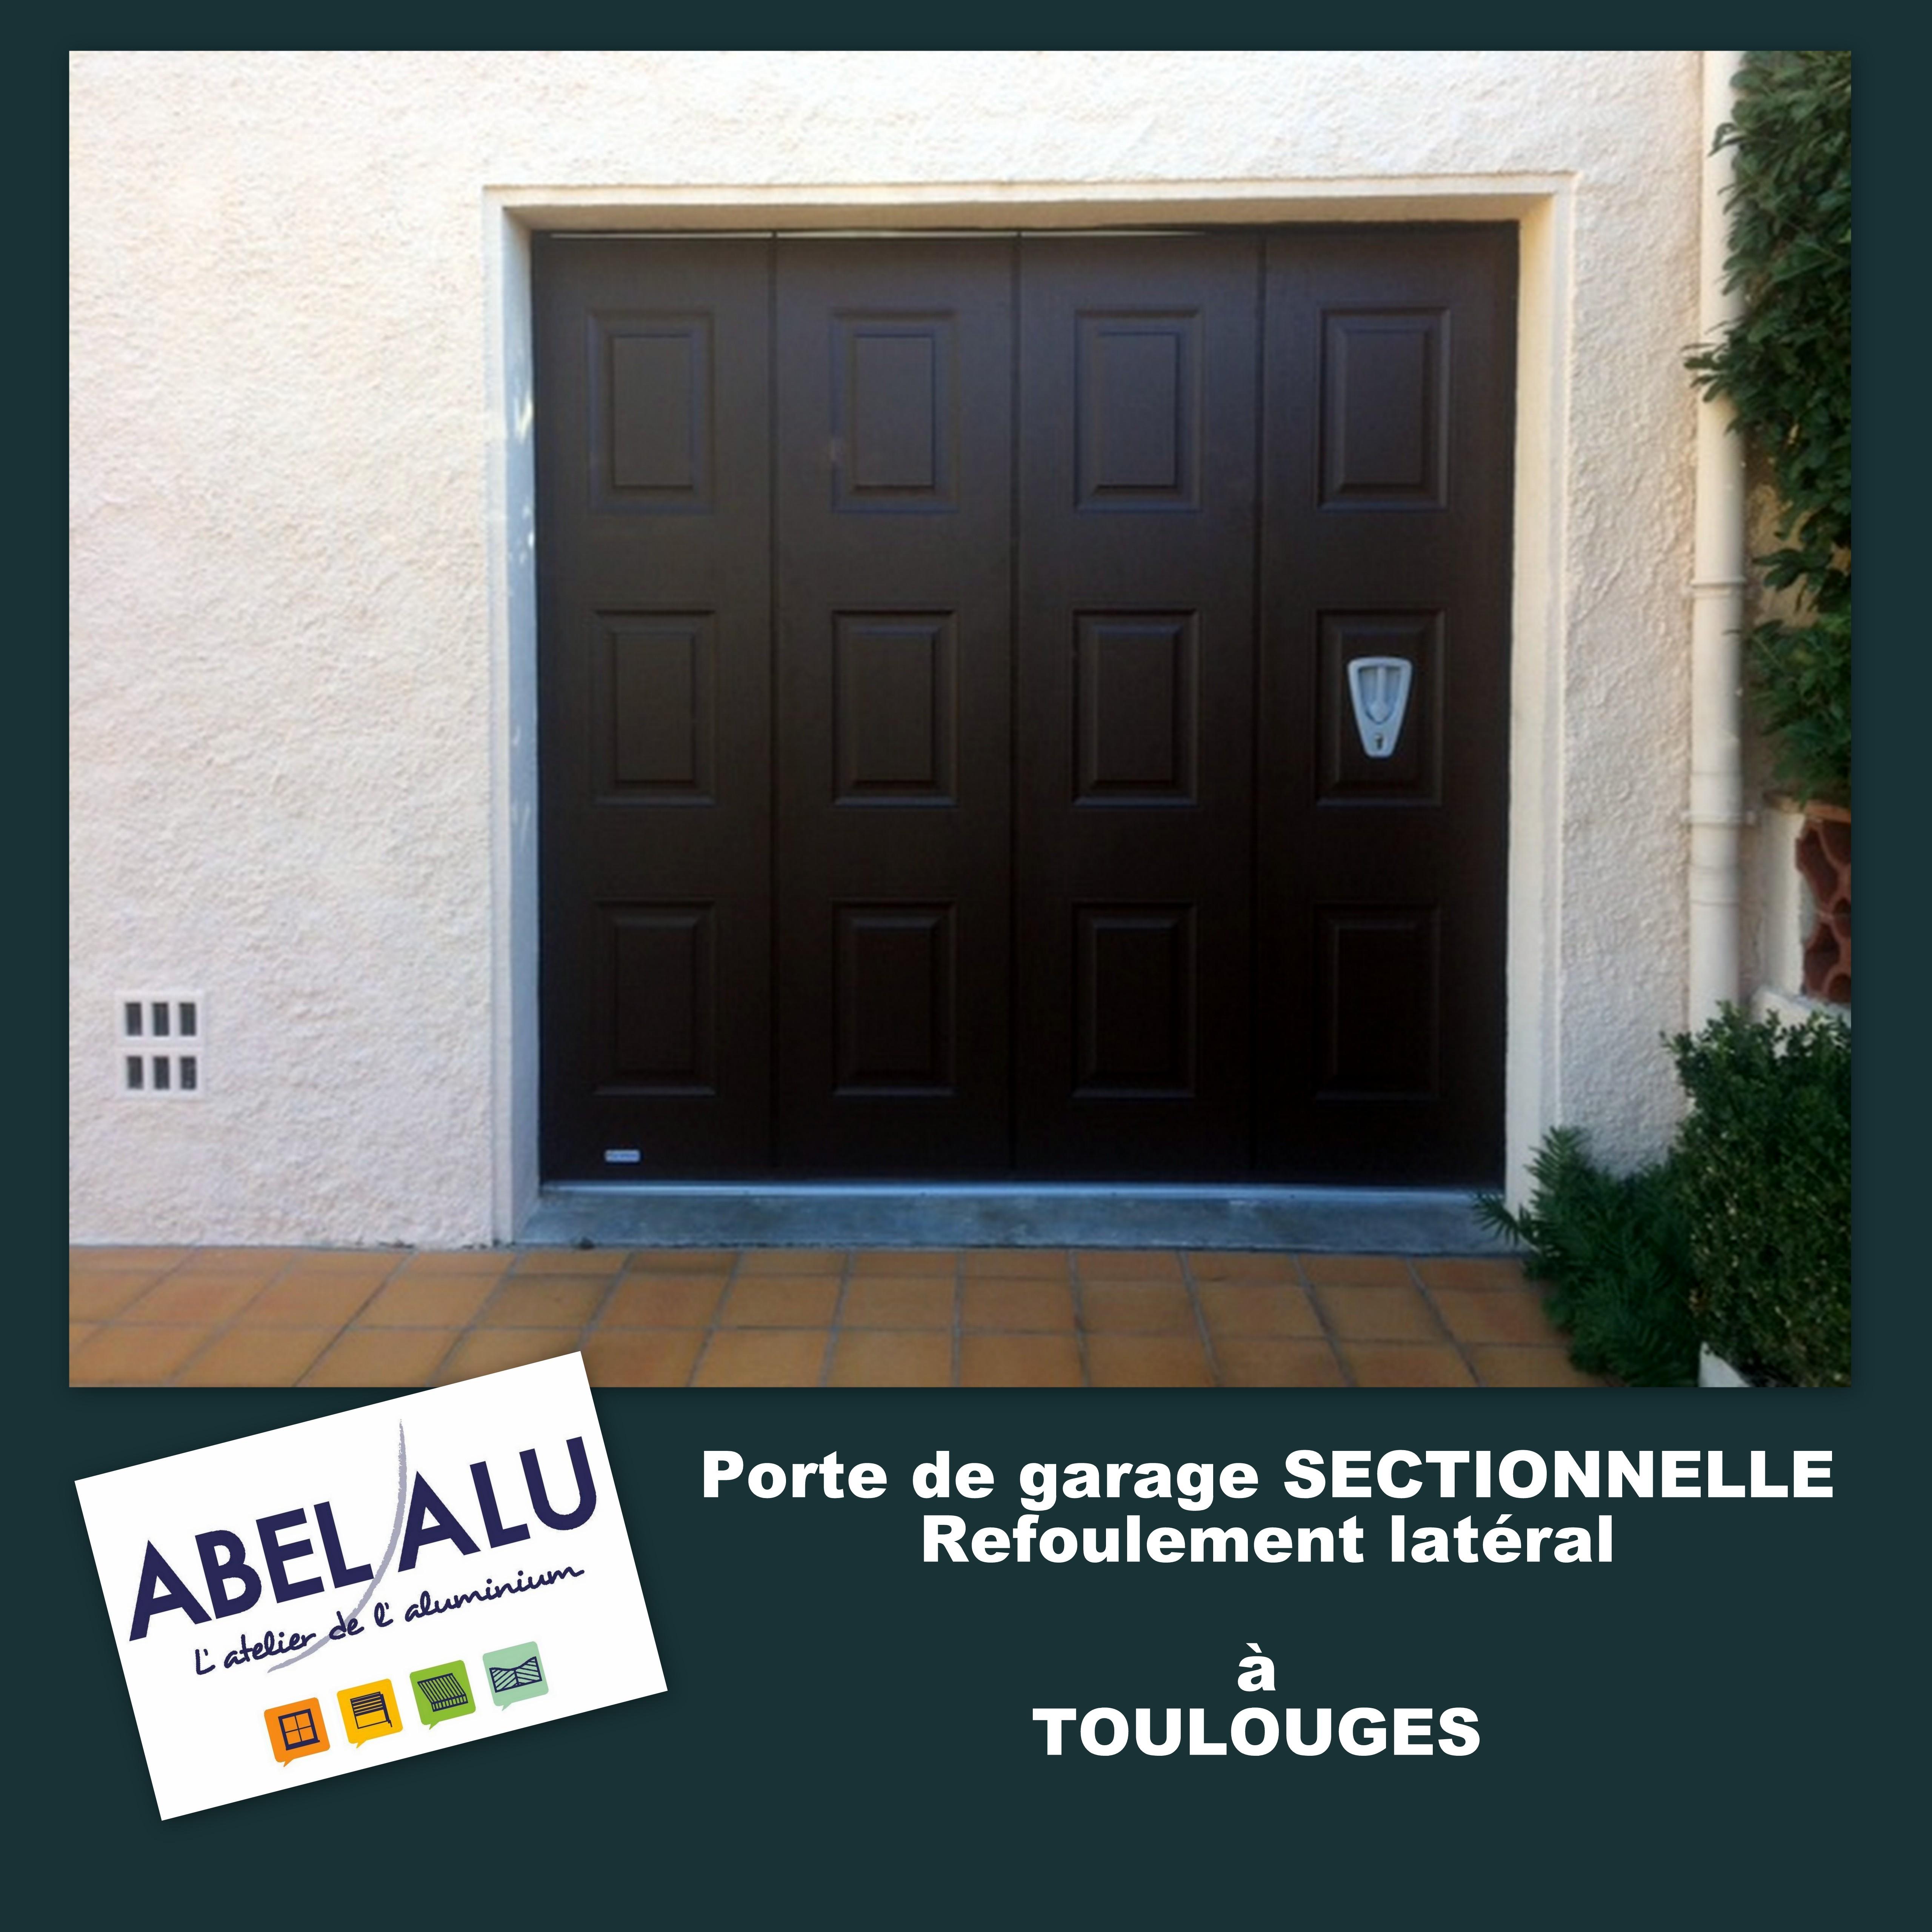 R alisation porte de garage sectionnelle refoulement lat ral toulouges abel alu - Porte garage battant alu ...